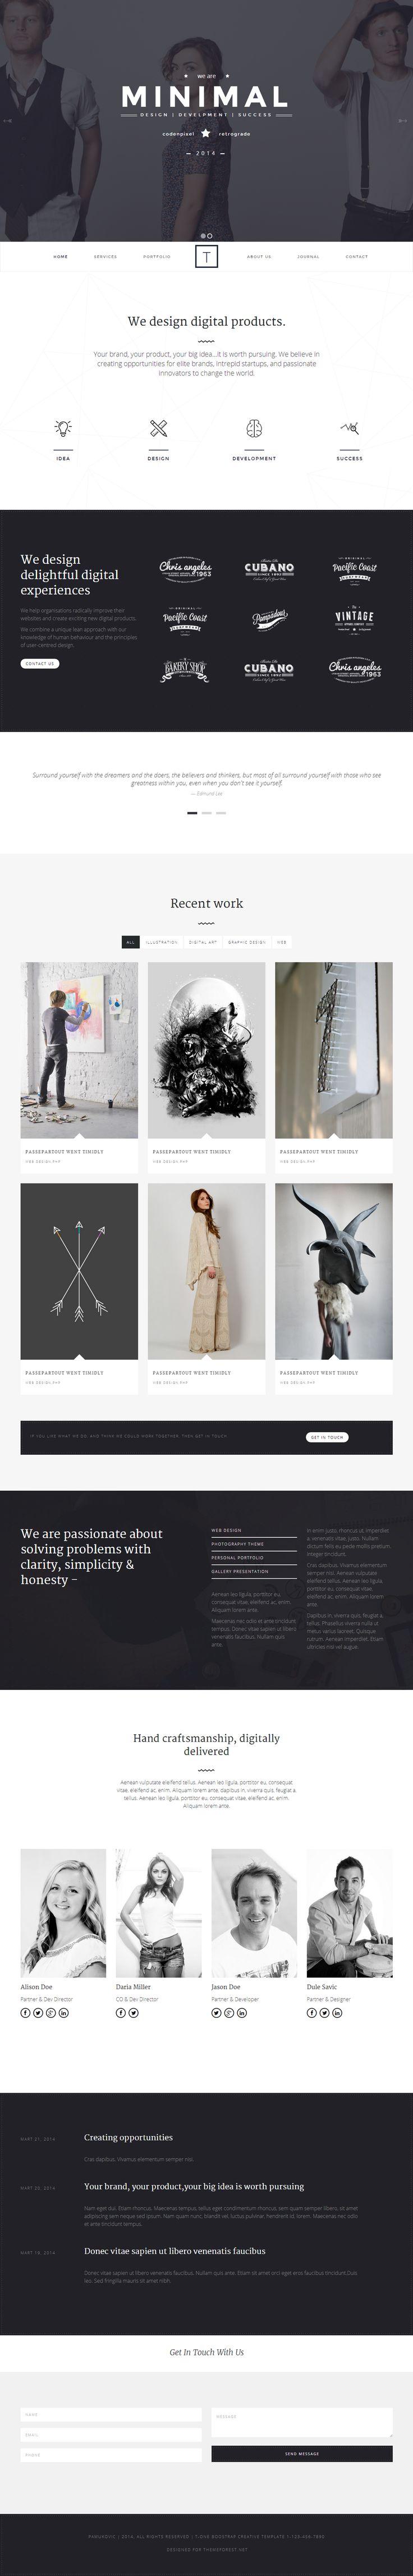 220 best Free WordPress Themes images on Pinterest | Wordpress ...